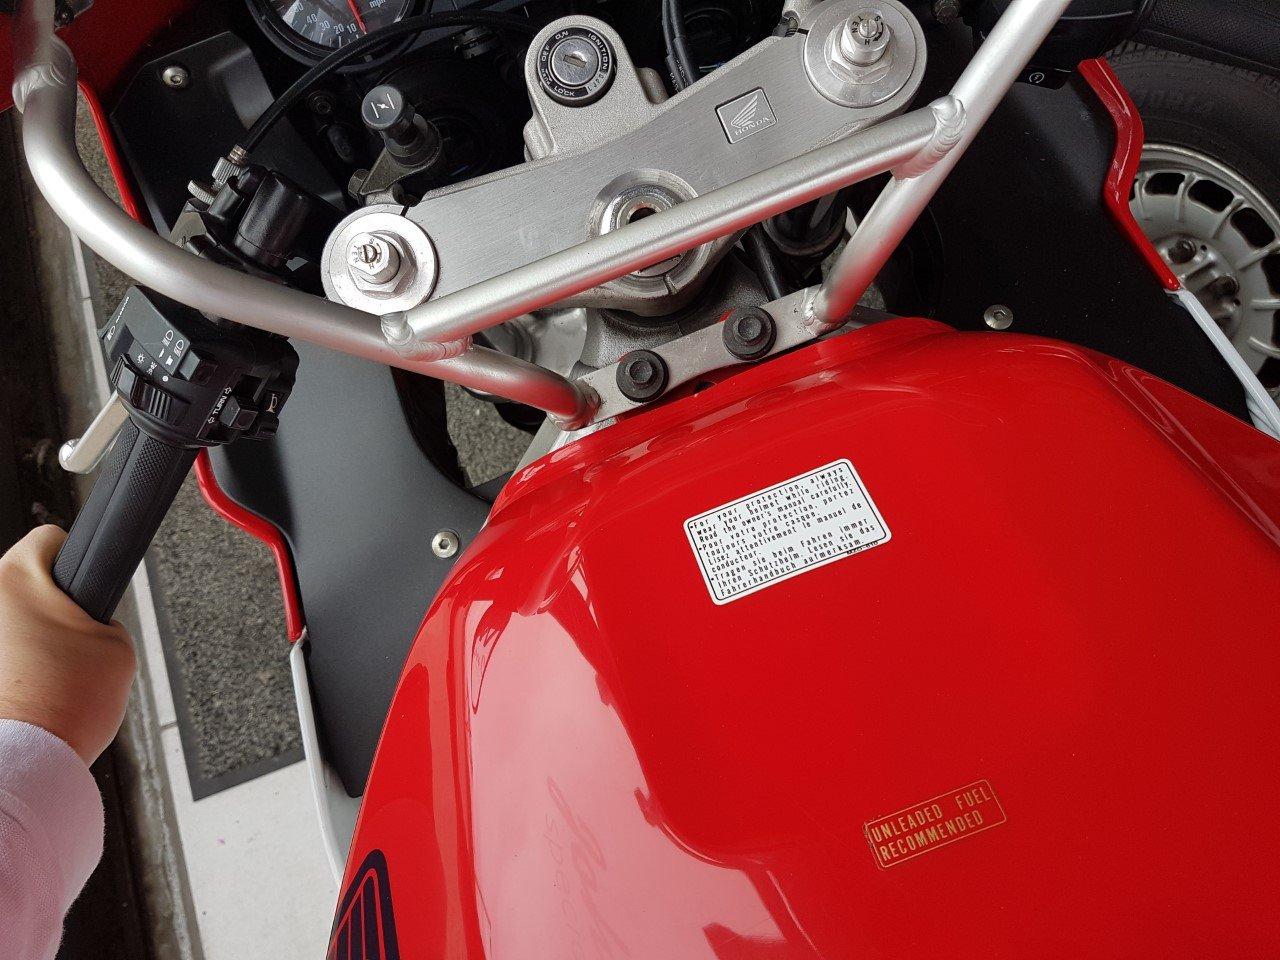 1999 Honda CBR 900 RR Fireblade 13k Miles 1 Owner For Sale (picture 3 of 6)